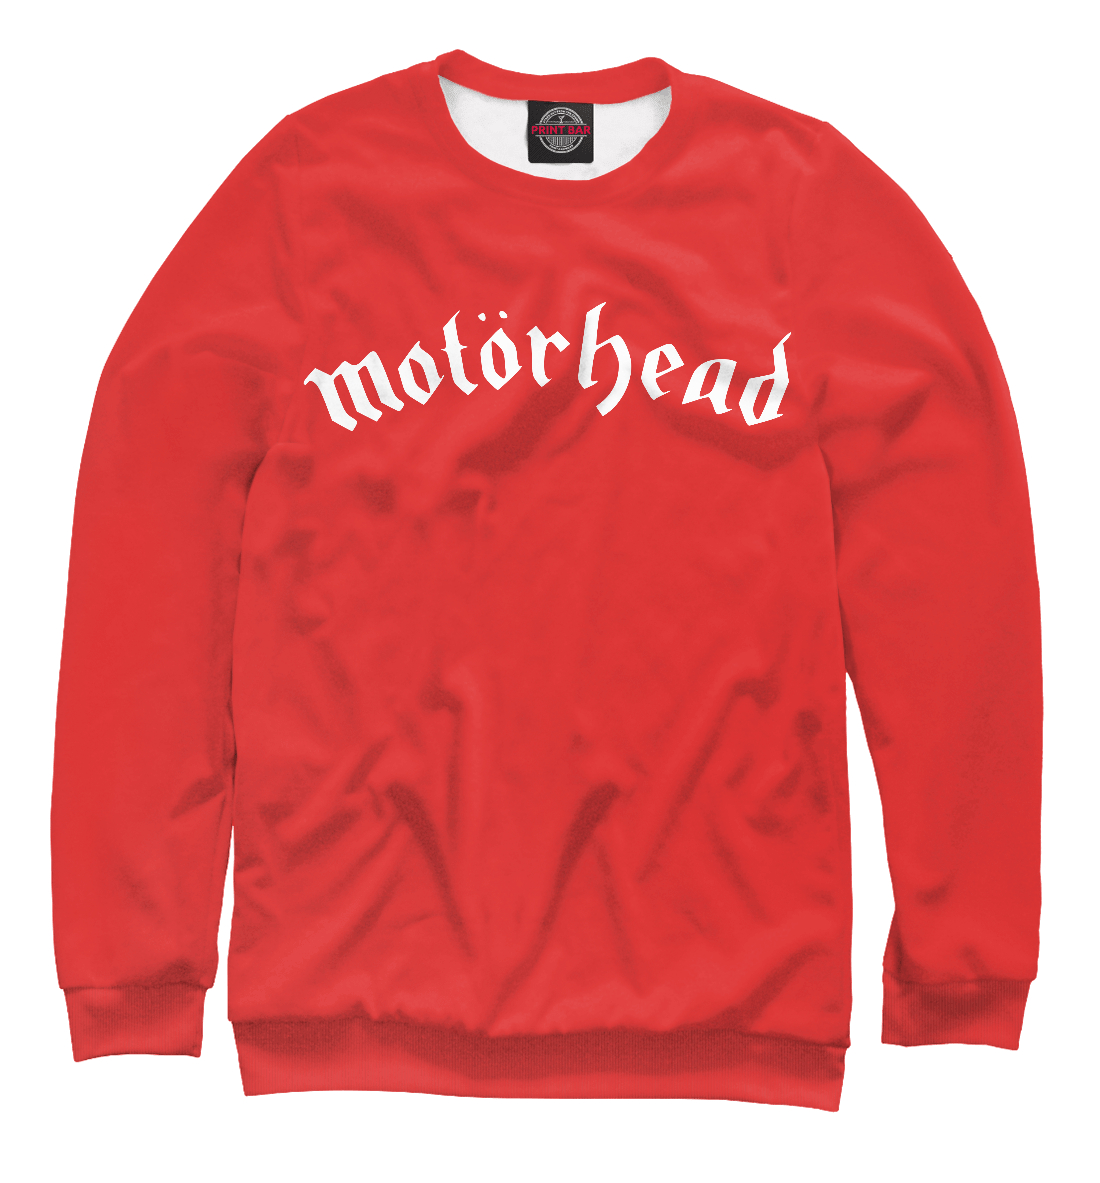 Купить Motorhead, Printbar, Свитшоты, MOT-763791-swi-2